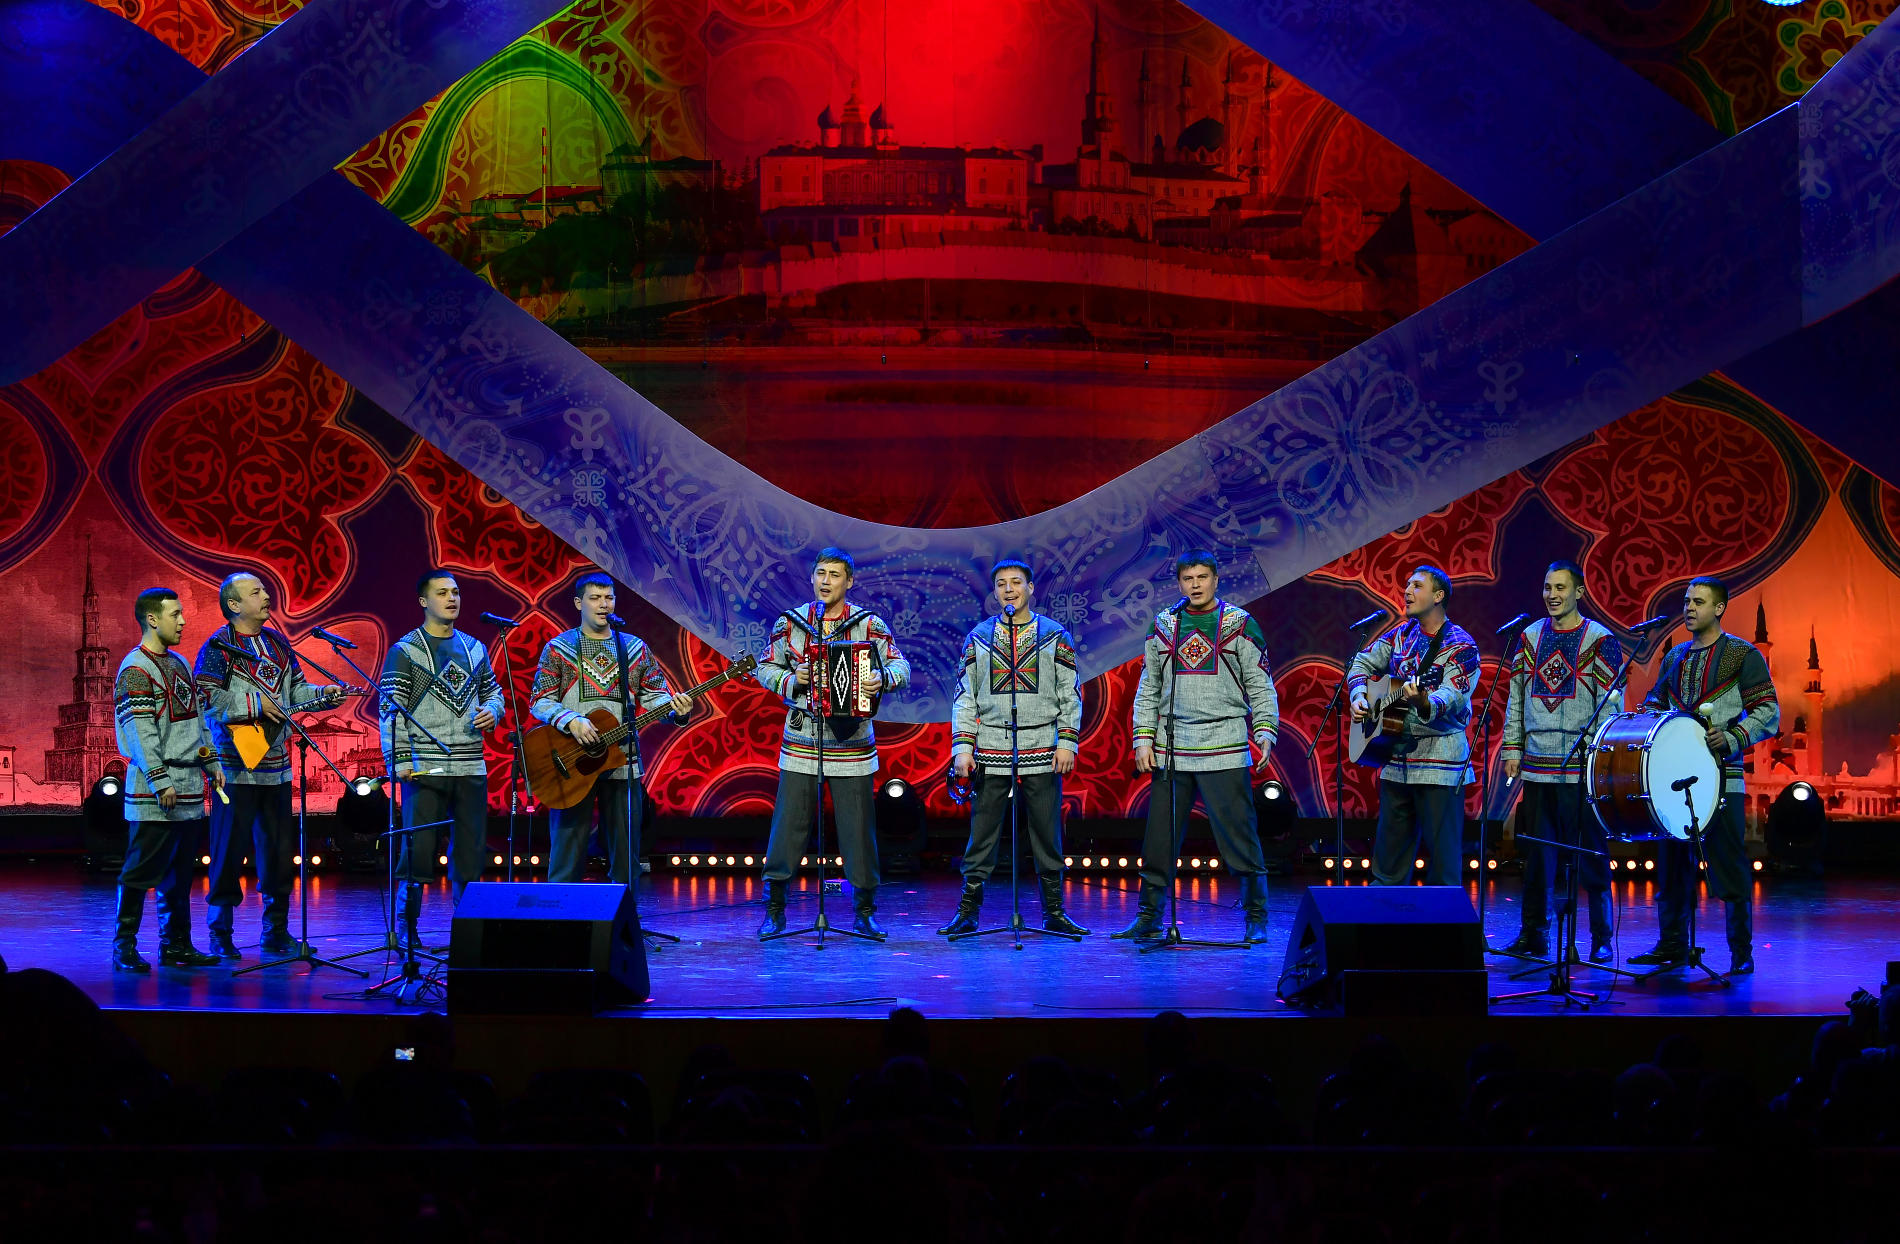 Ансамбль народной музыки «Раштав» («Газпром трансгаз Нижний Новгород»)